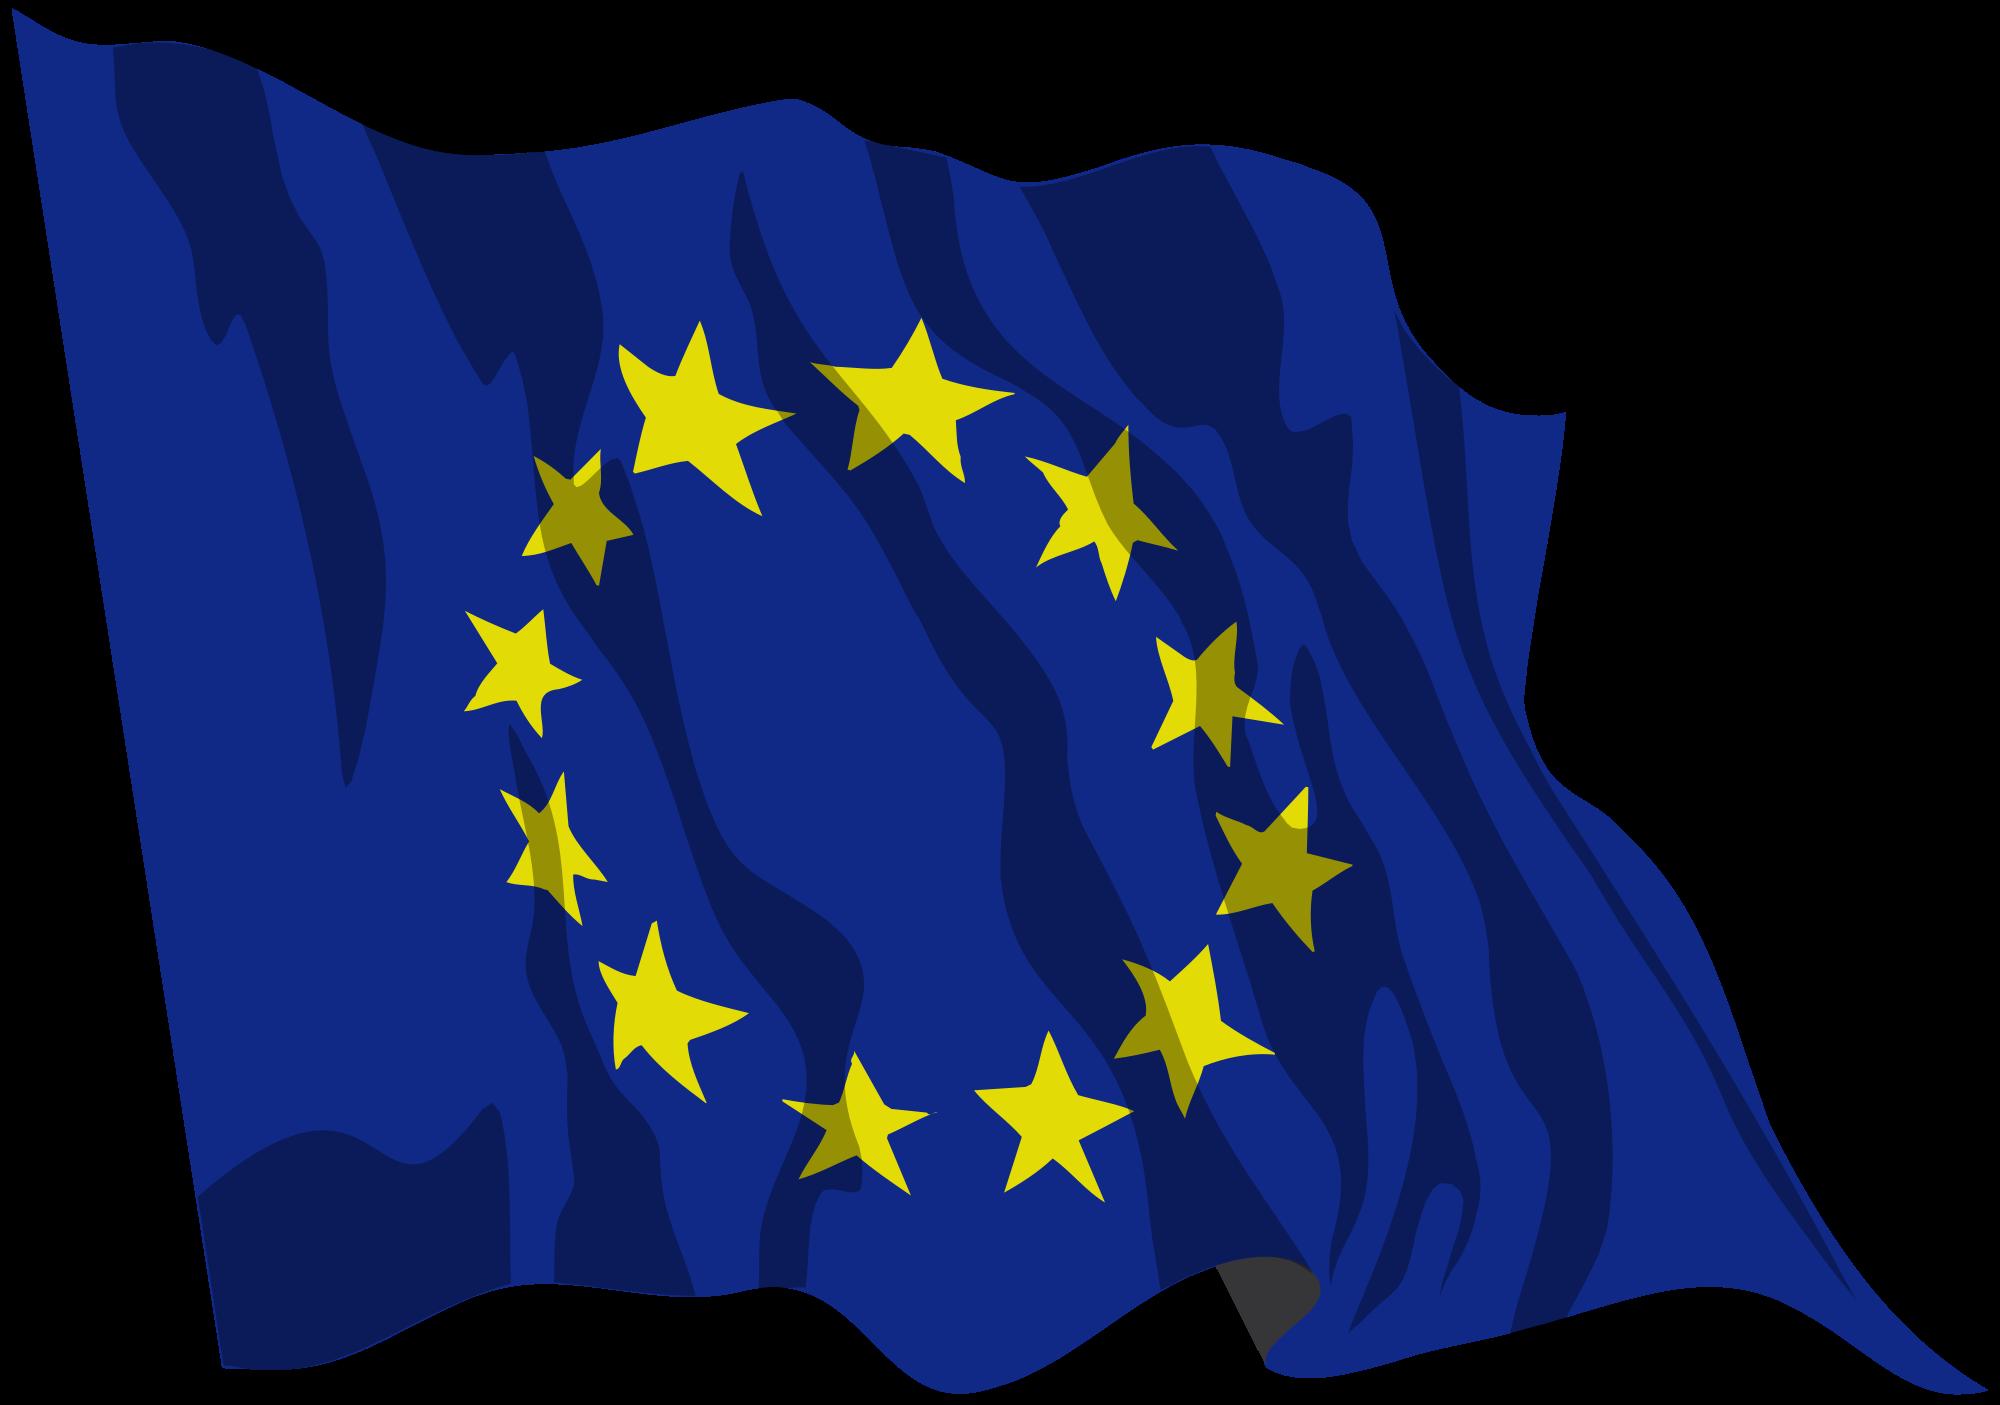 Europe clipart flag europe. Eu png transparent images